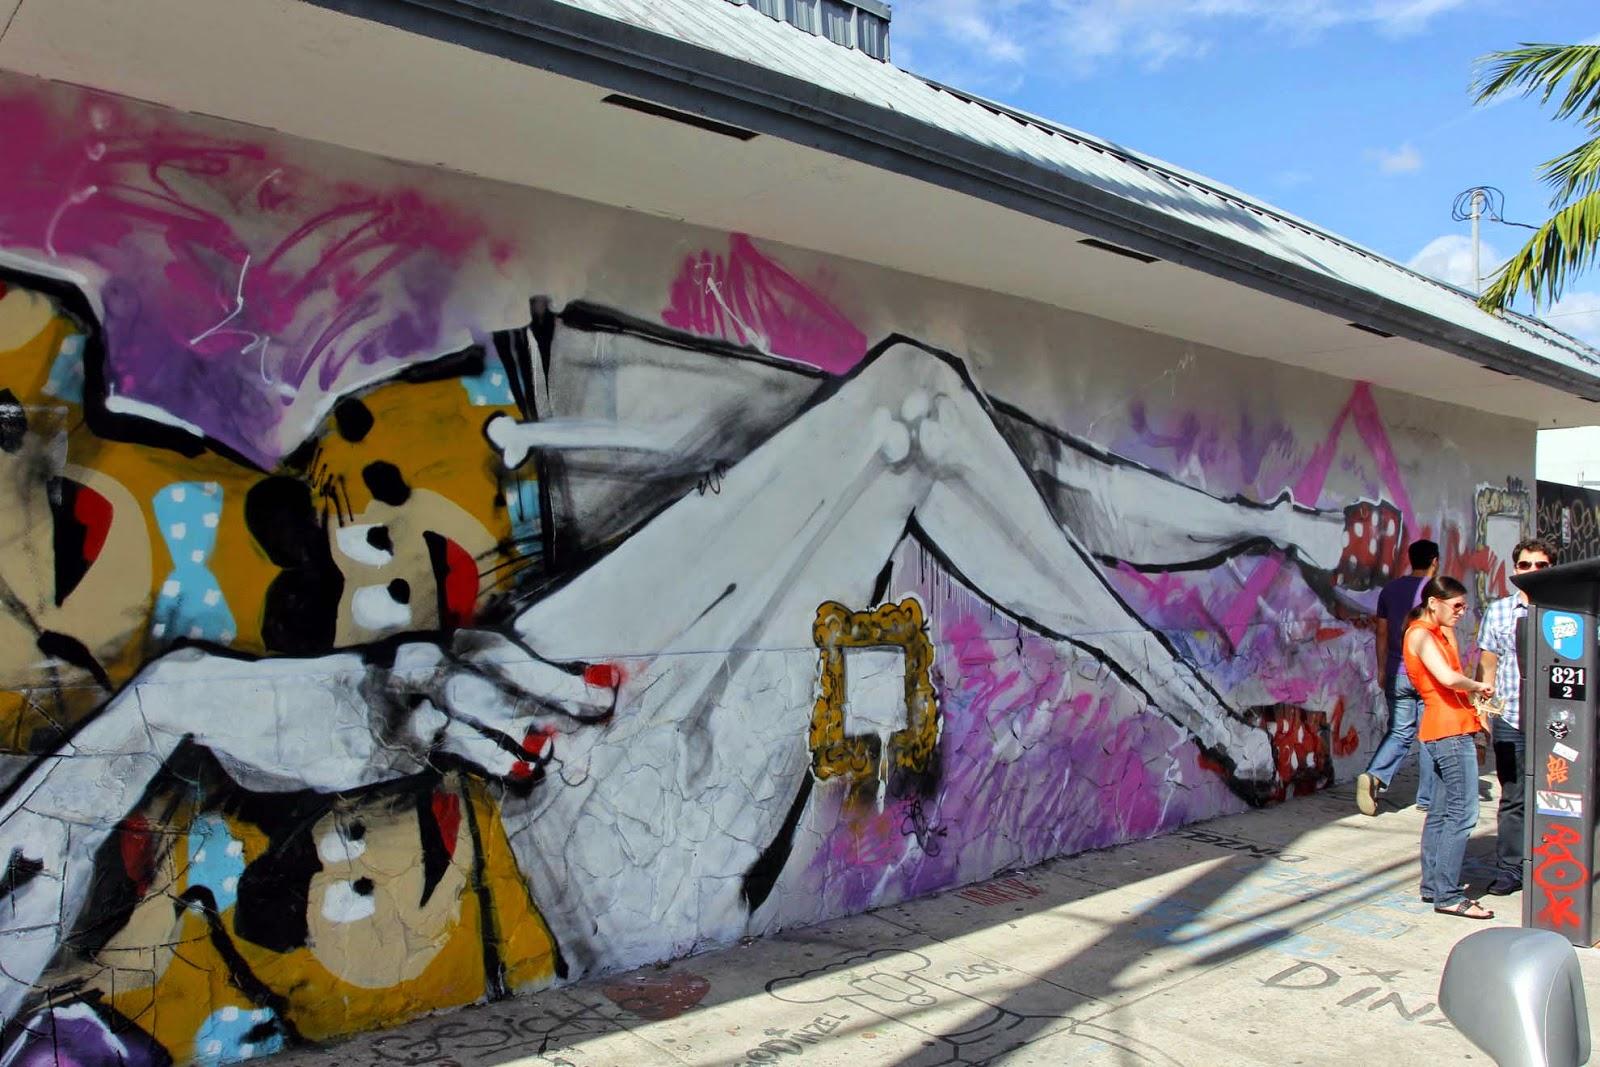 anthony-lister-new-mural-at-art-basel-2014-05